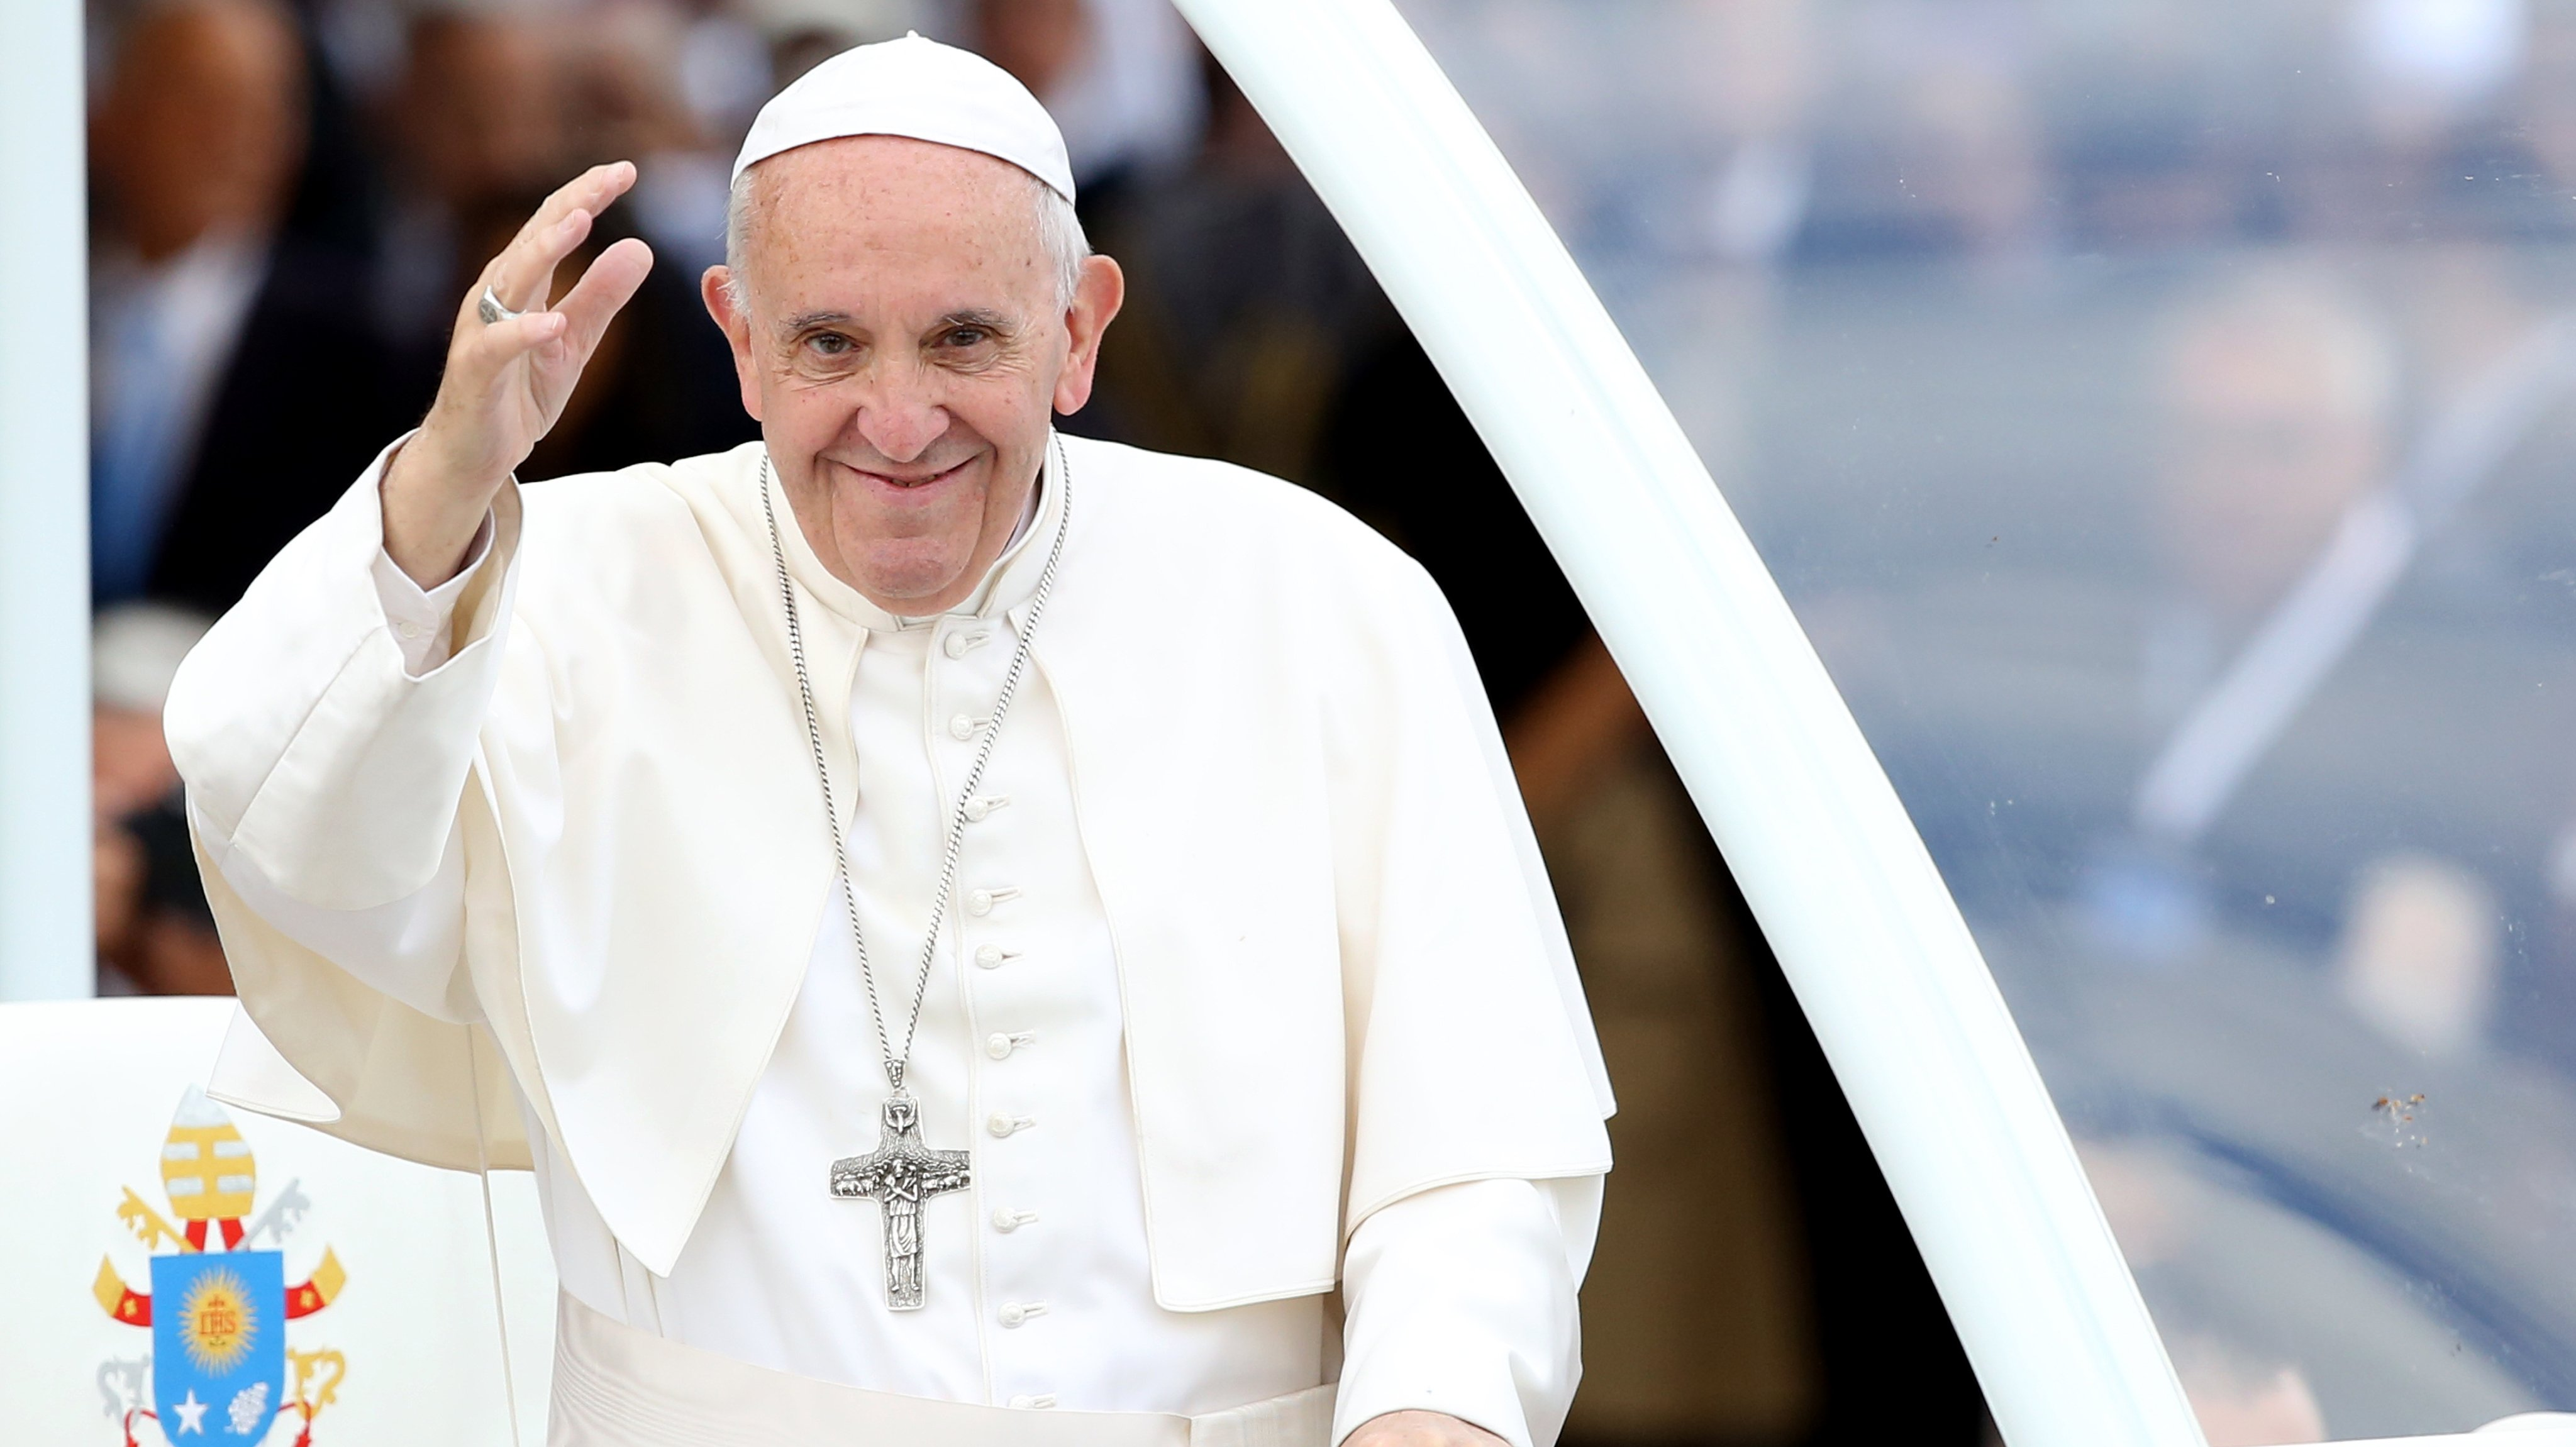 Pope Francis Visit The Fatima Sanctuary In Portugal